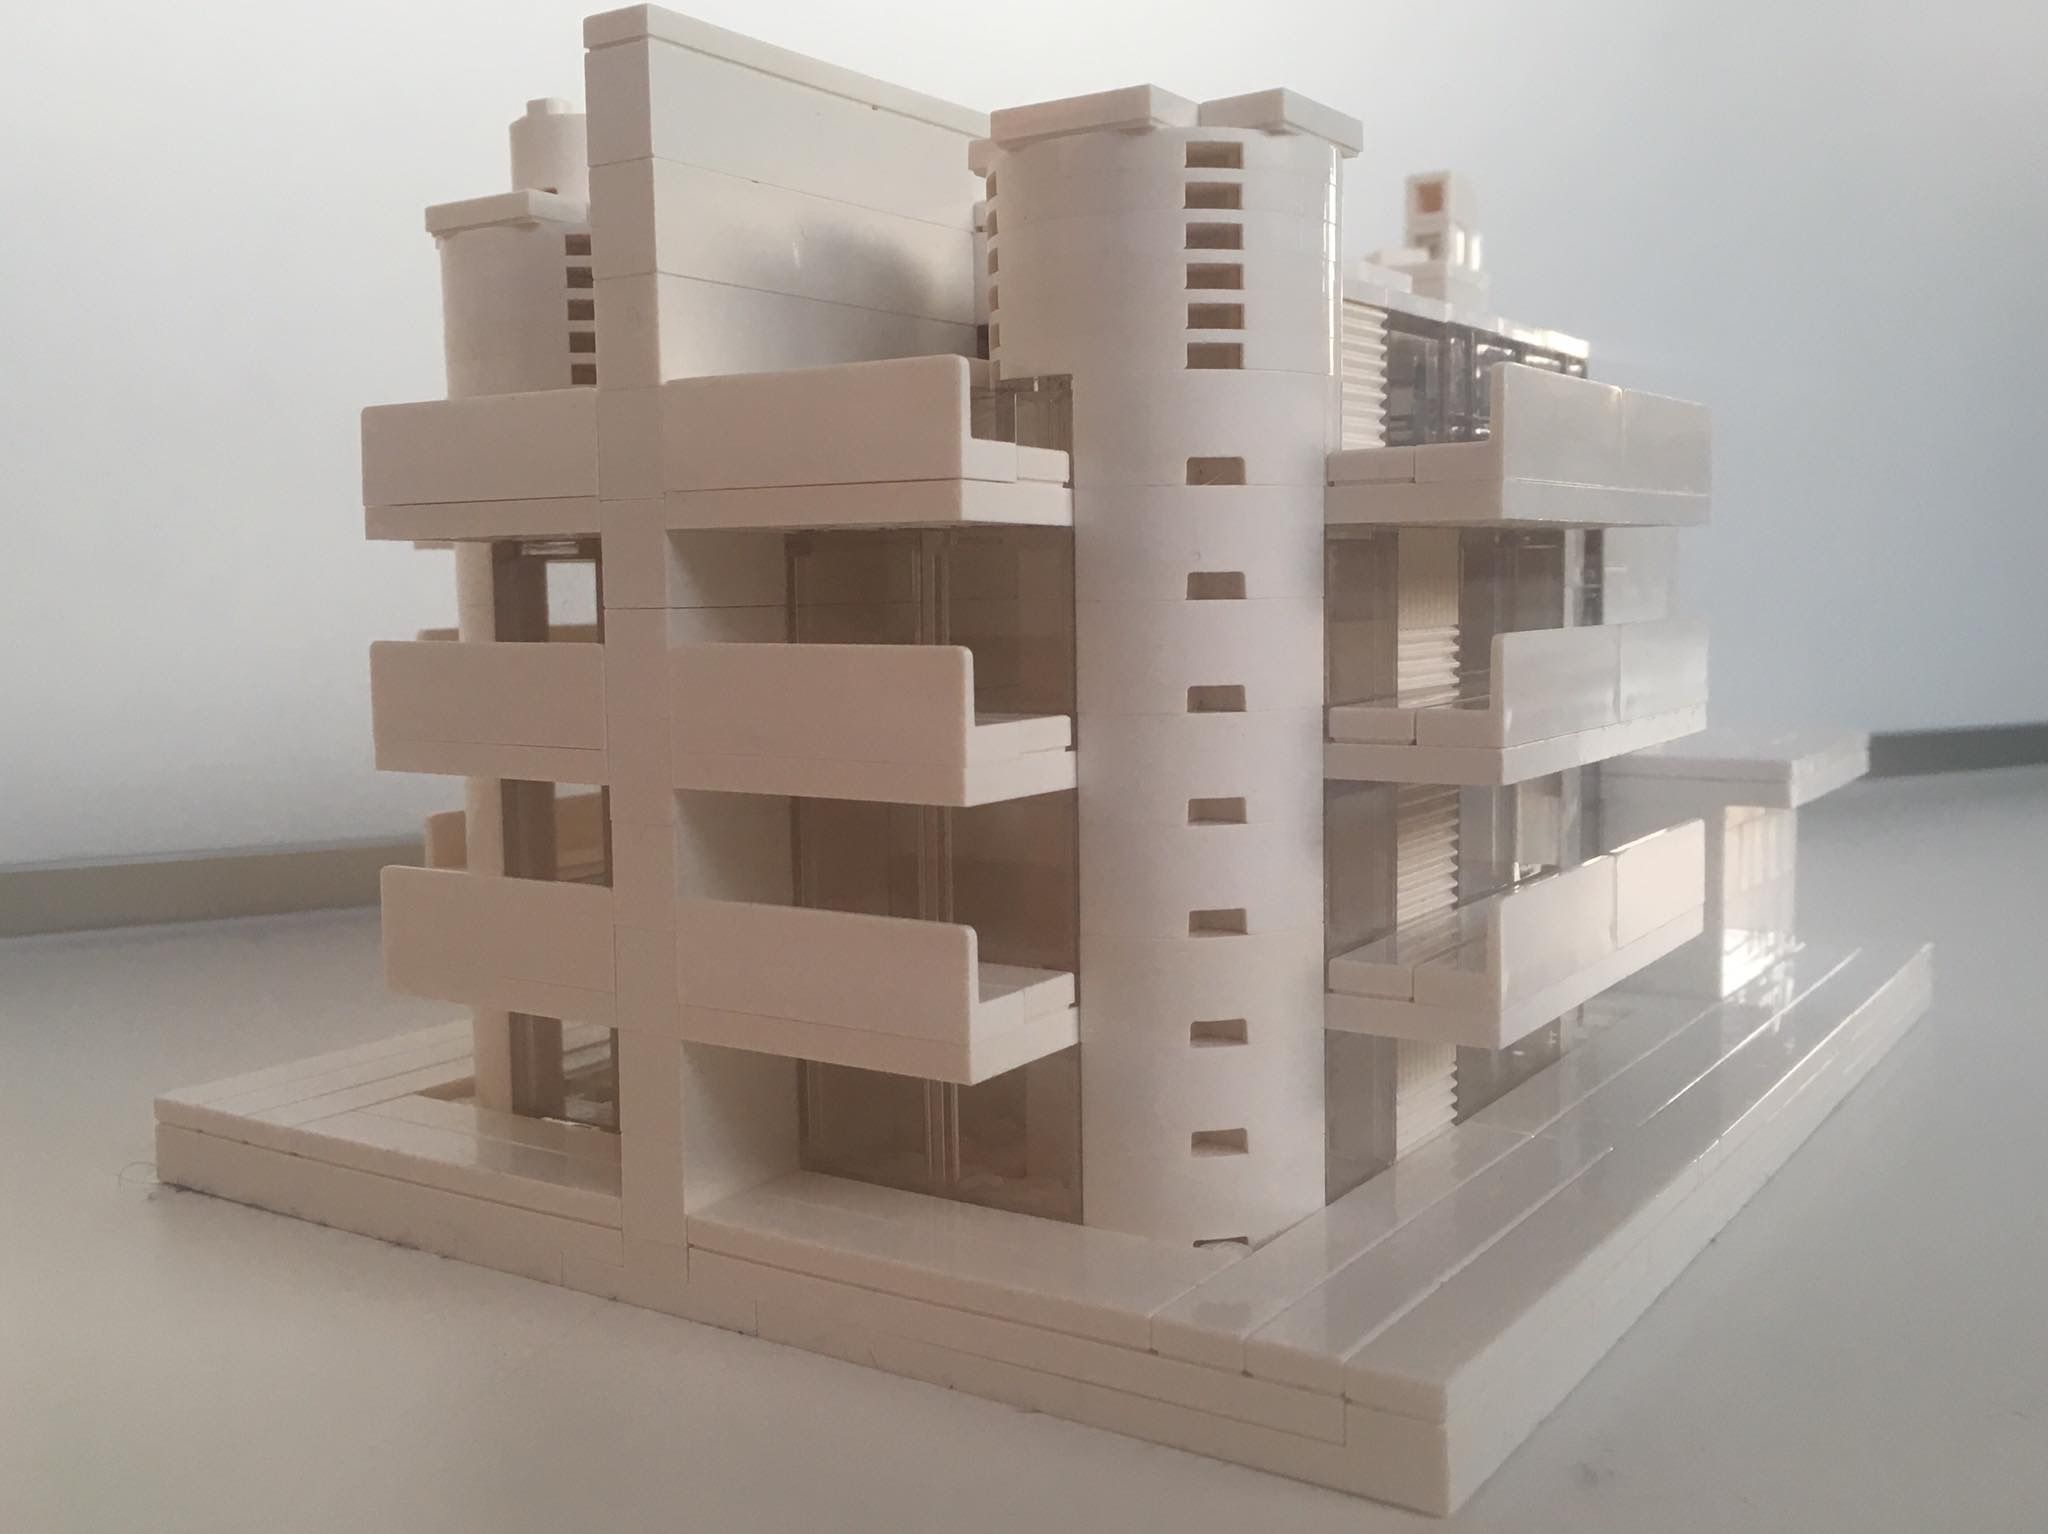 Lego Architecture, Lego Architecture Studio, Harm Bron ...